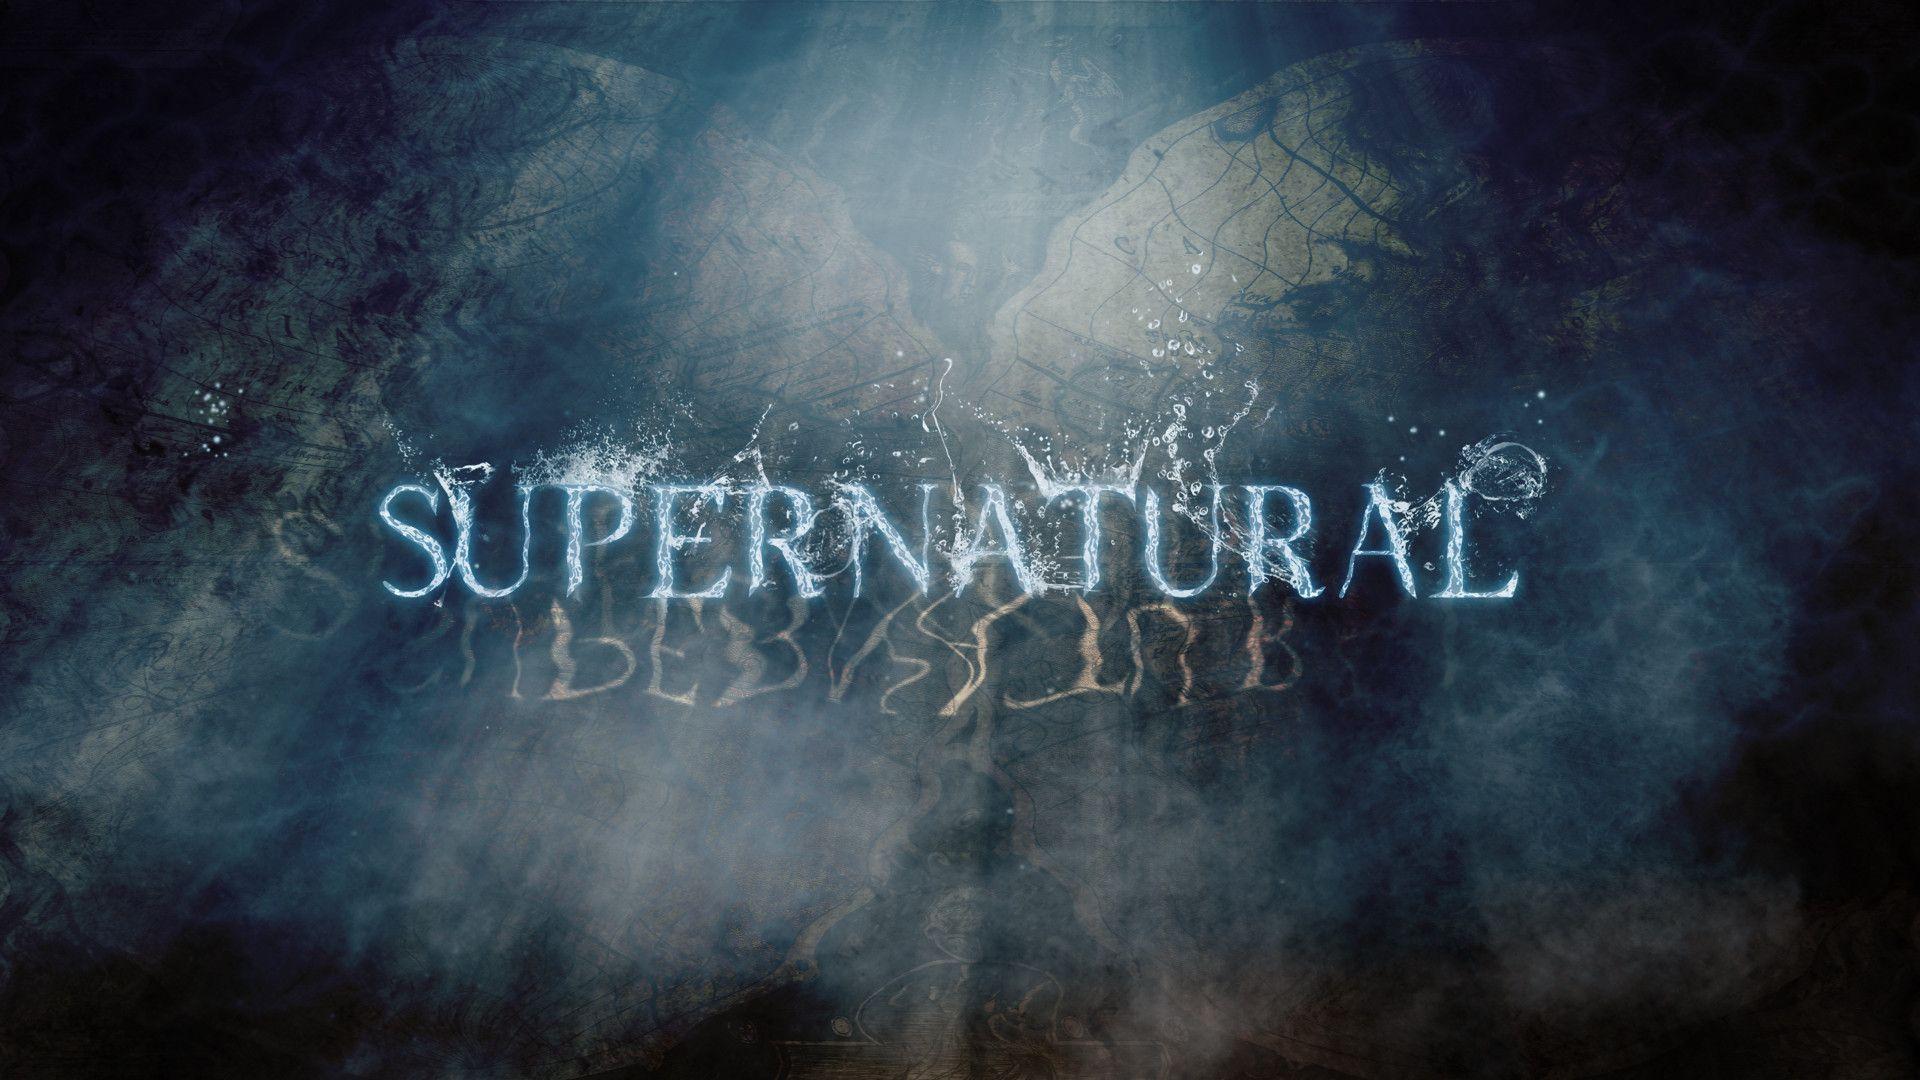 Supernatural wallpapers wallpaper cave Got online hd